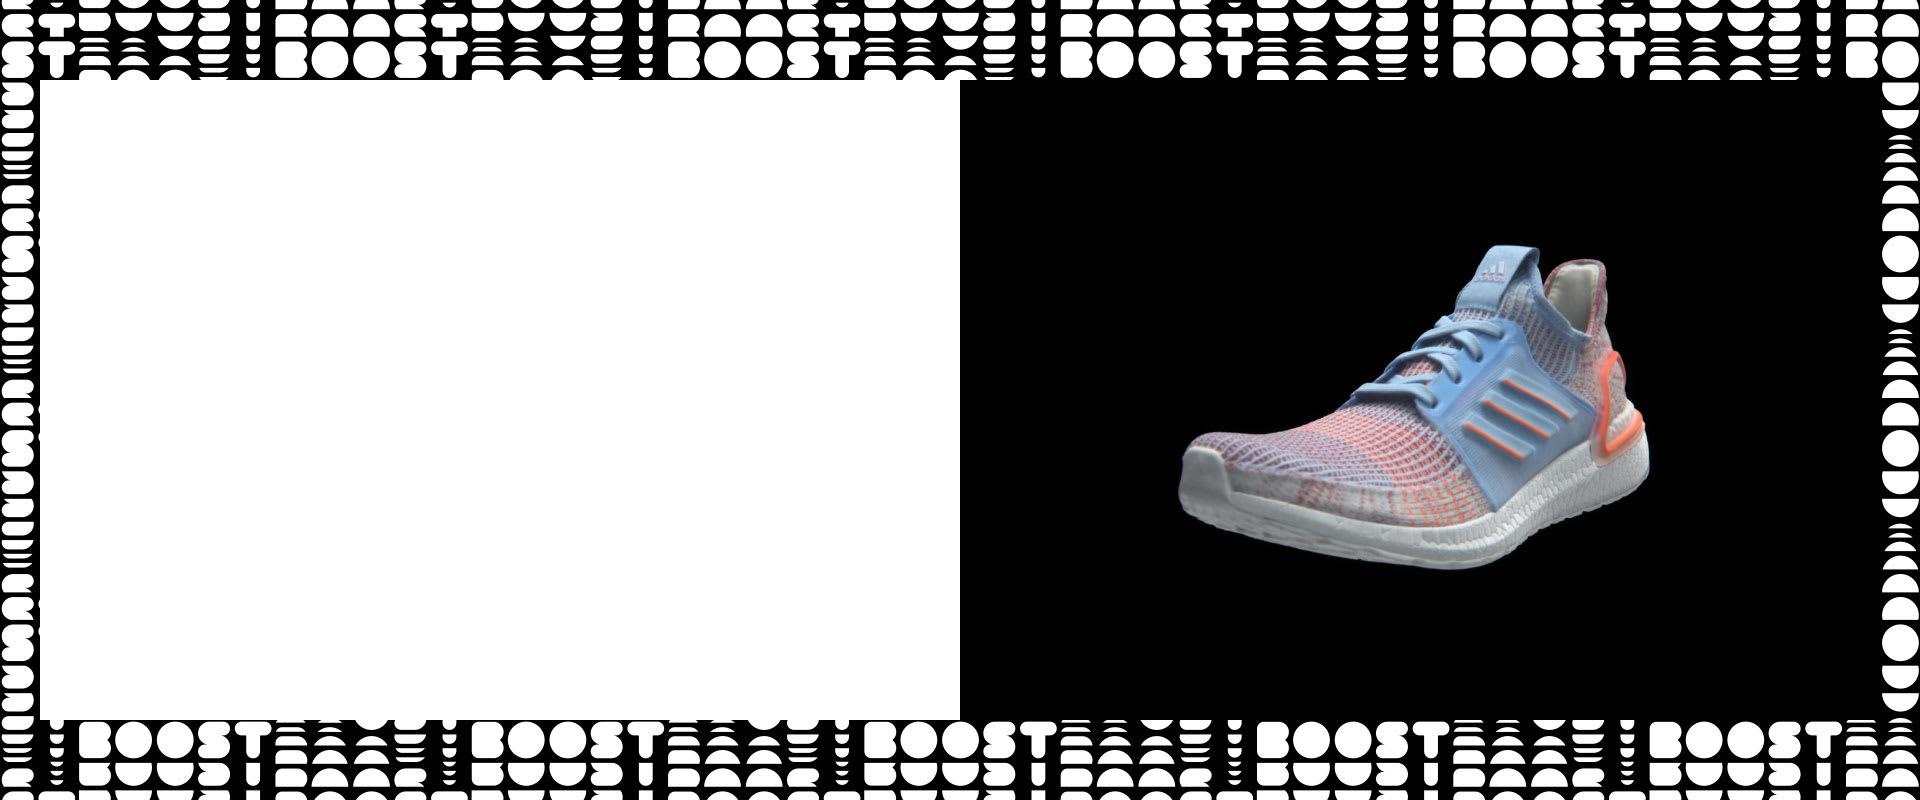 69ce06746aa adidas® Officiële Website Nederland |Sportwinkel